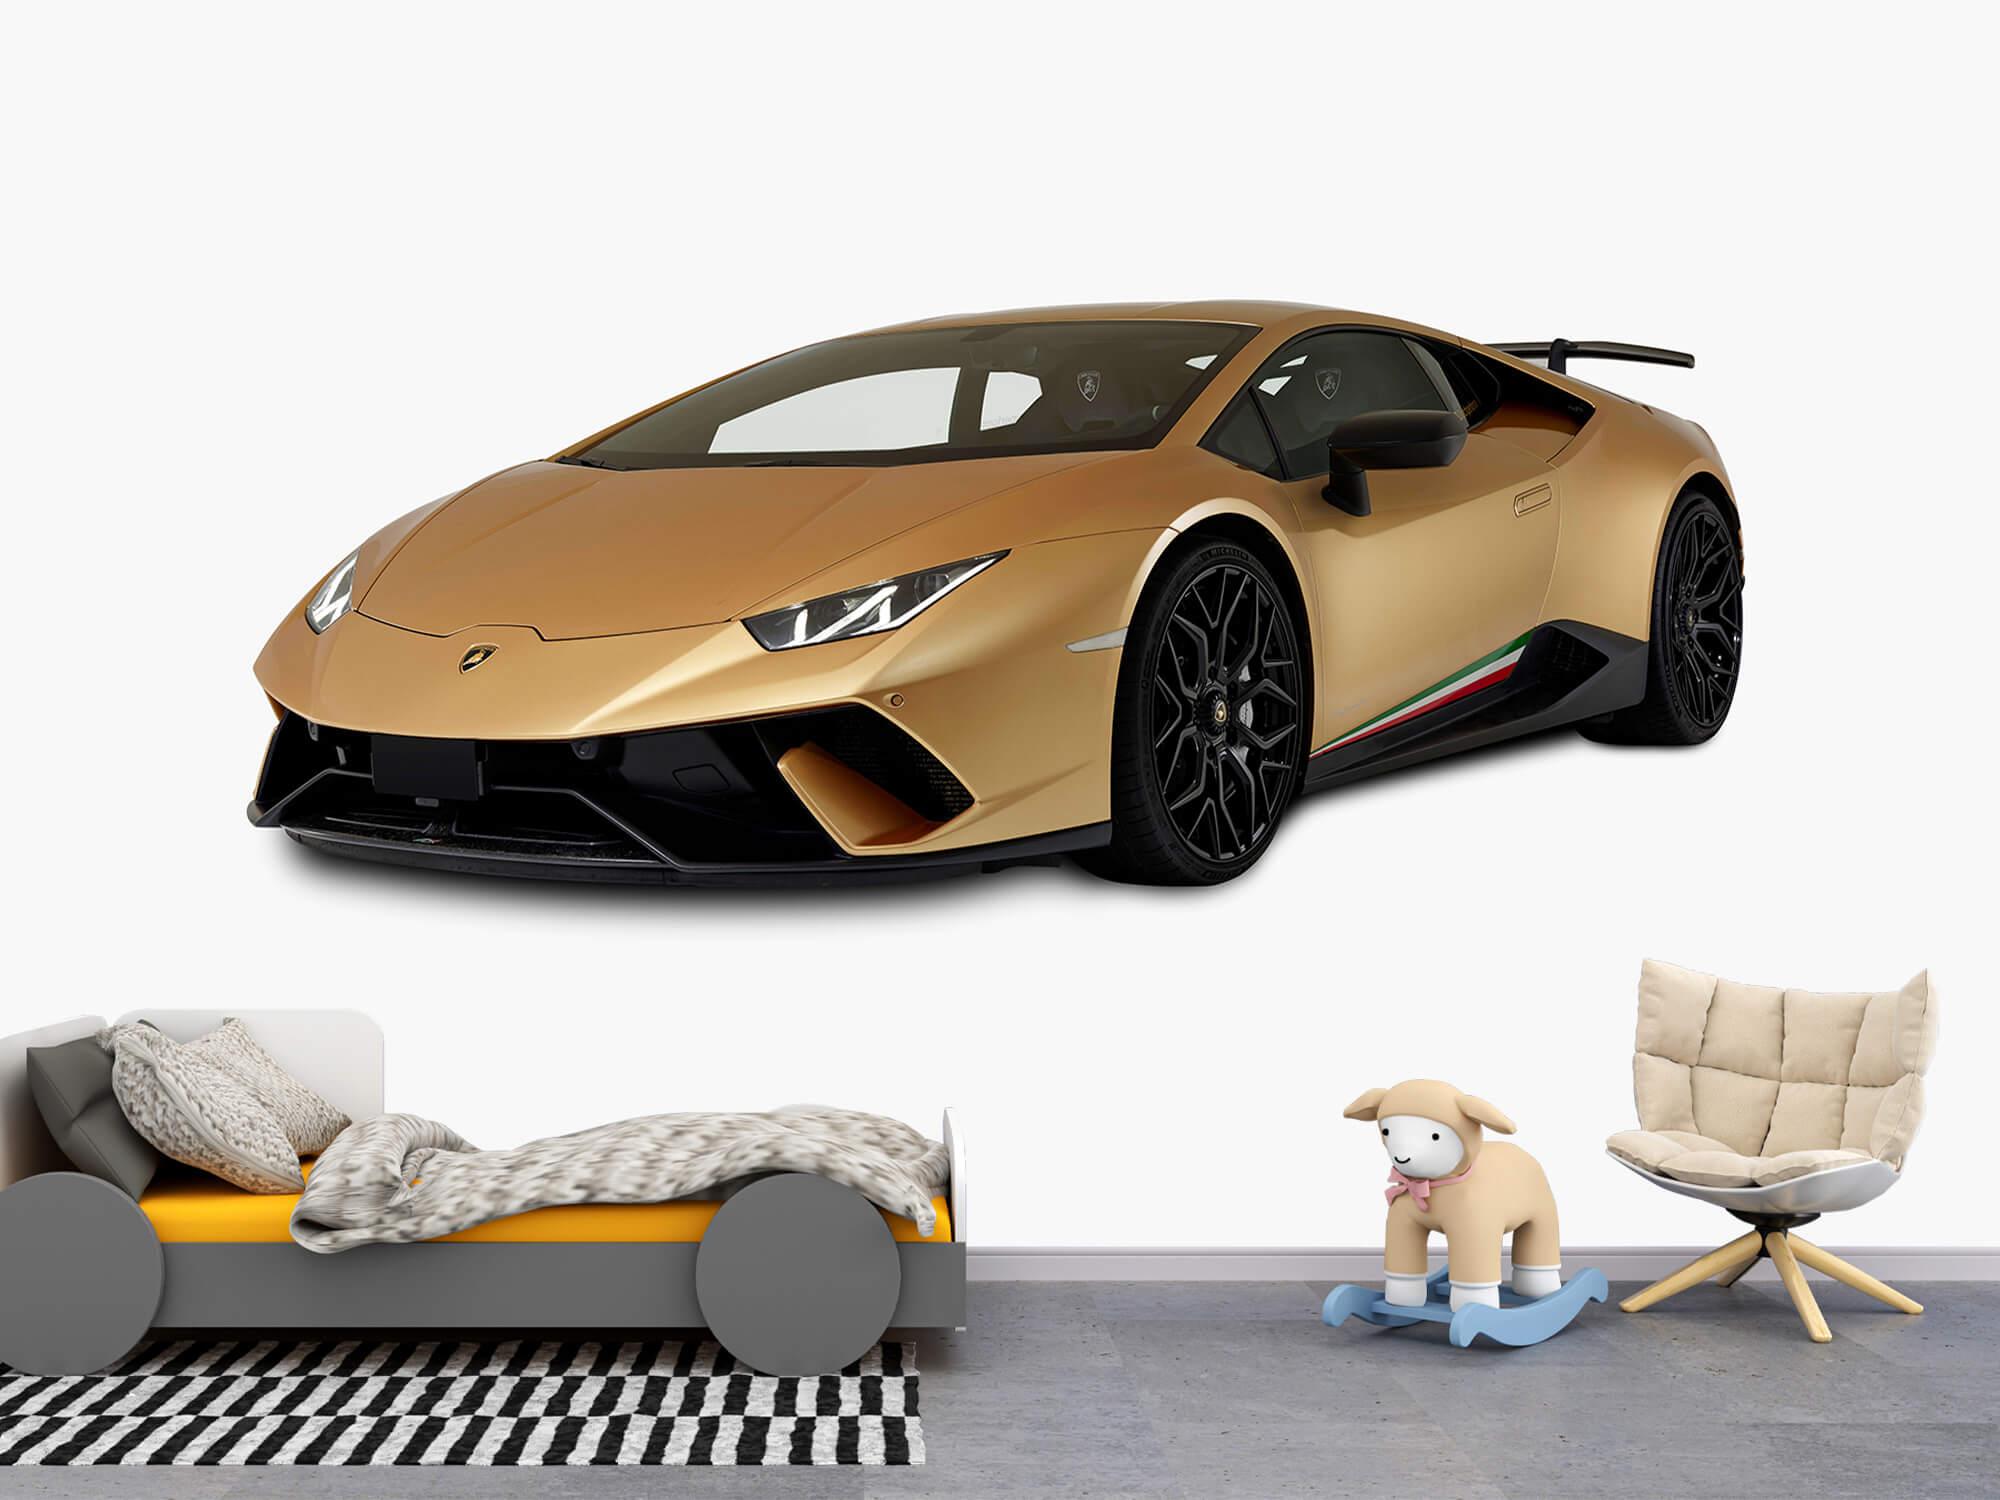 Wallpaper Lamborghini Huracán - Rechter voorkant wit 5